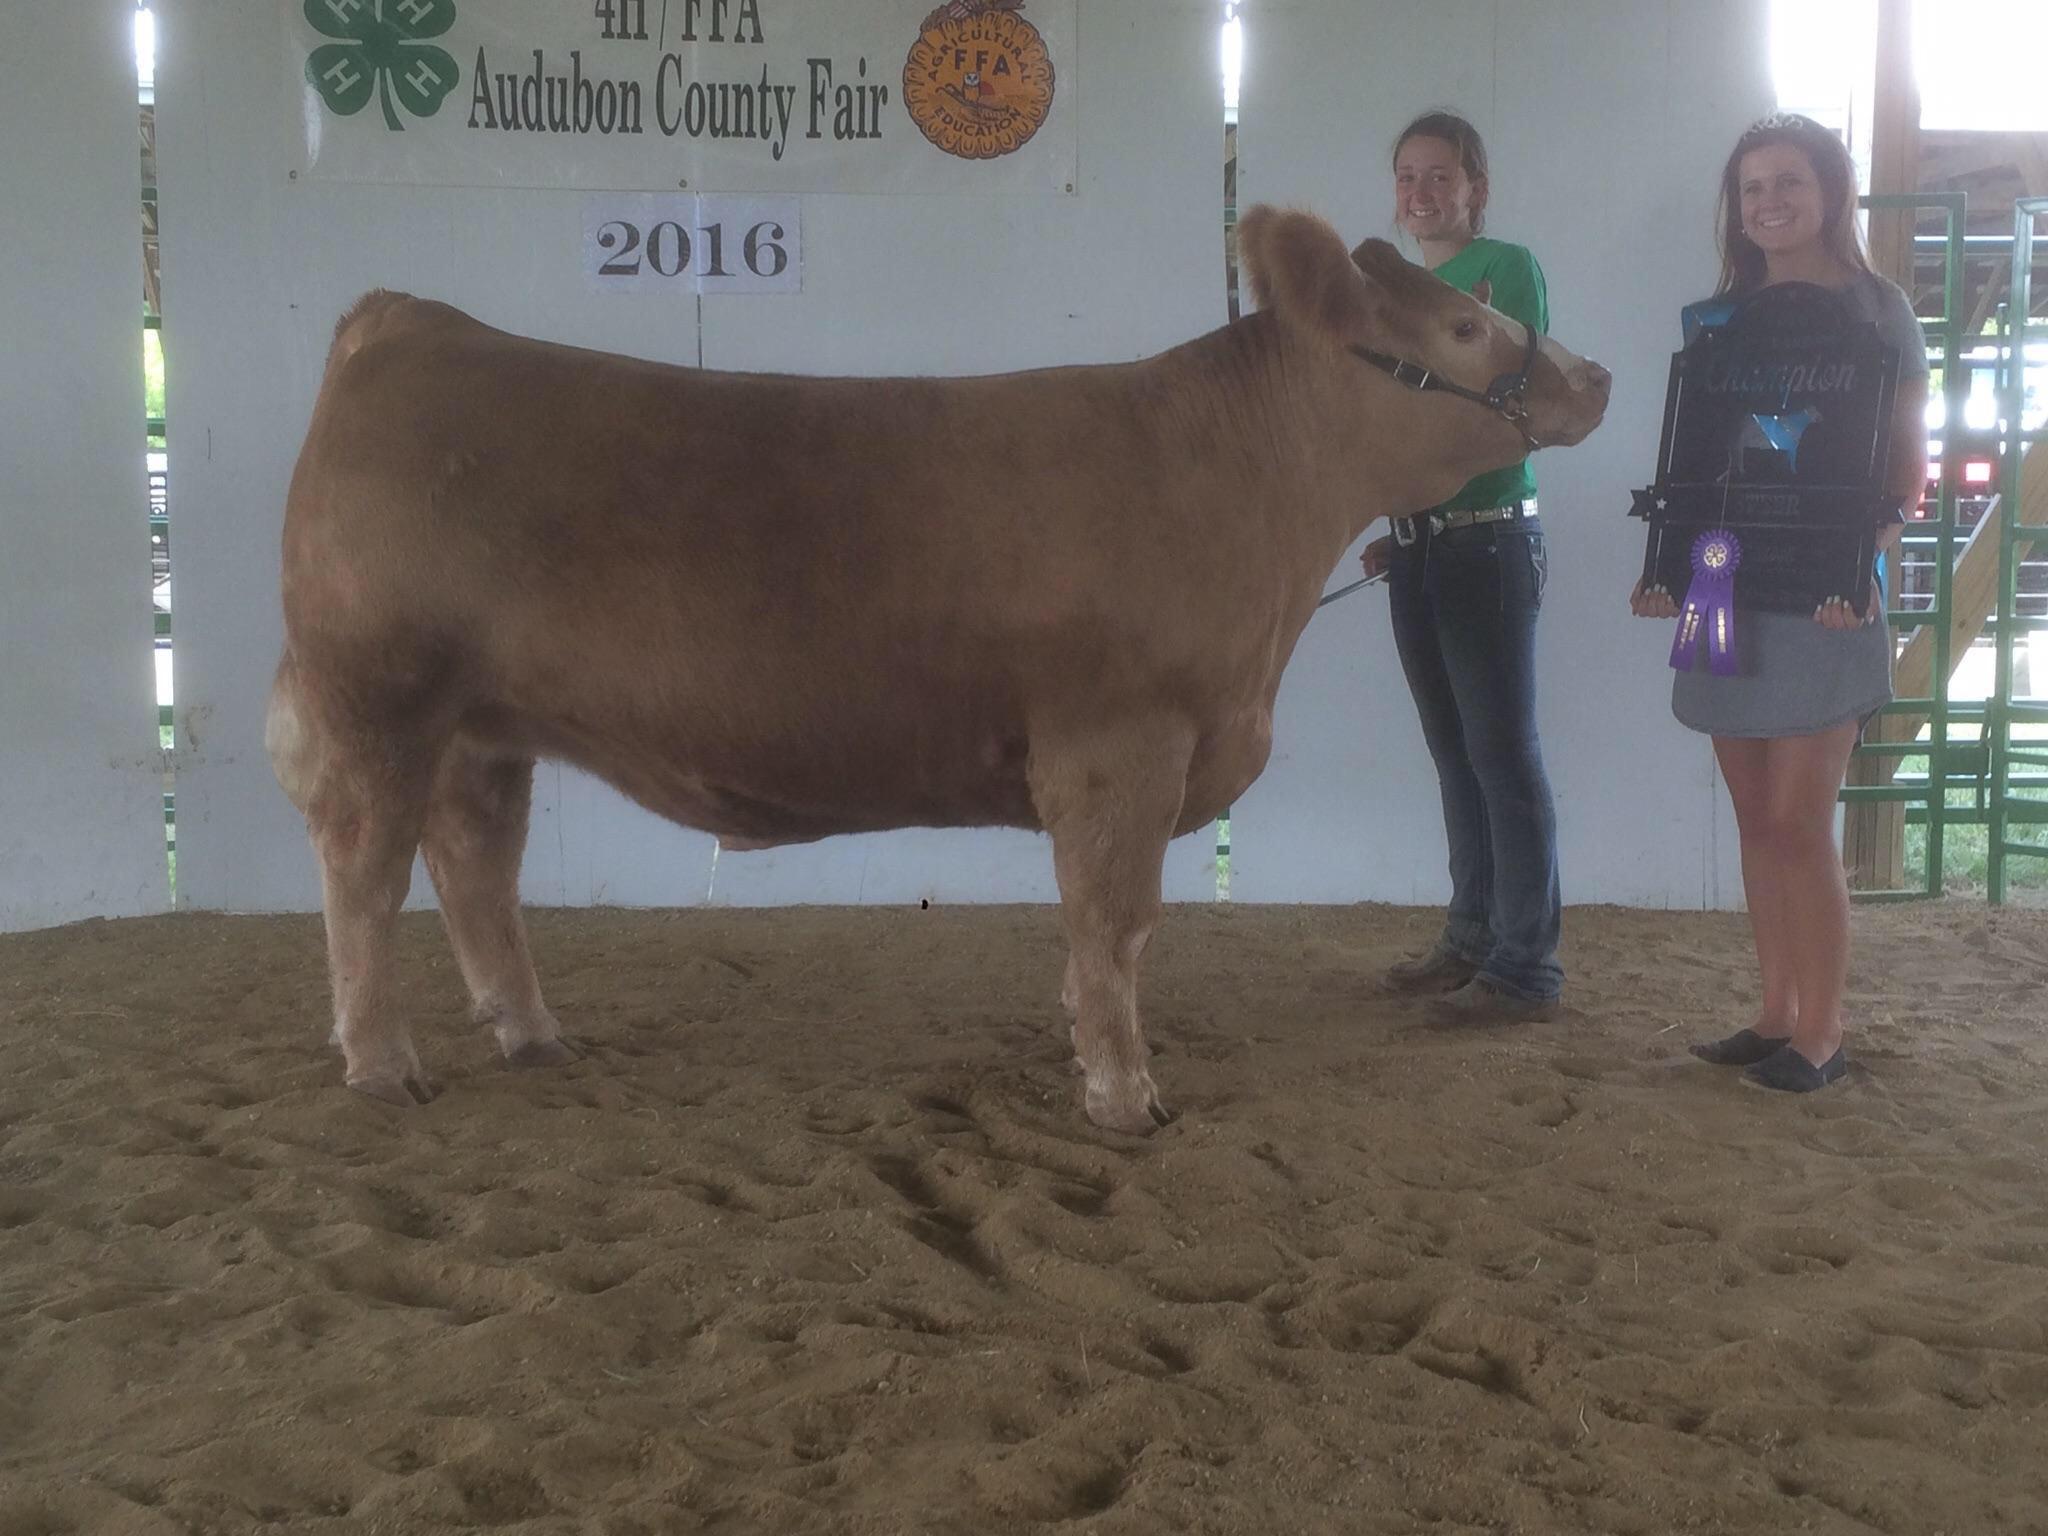 Another champion raised by danker show cattle of avoca iowa audubon